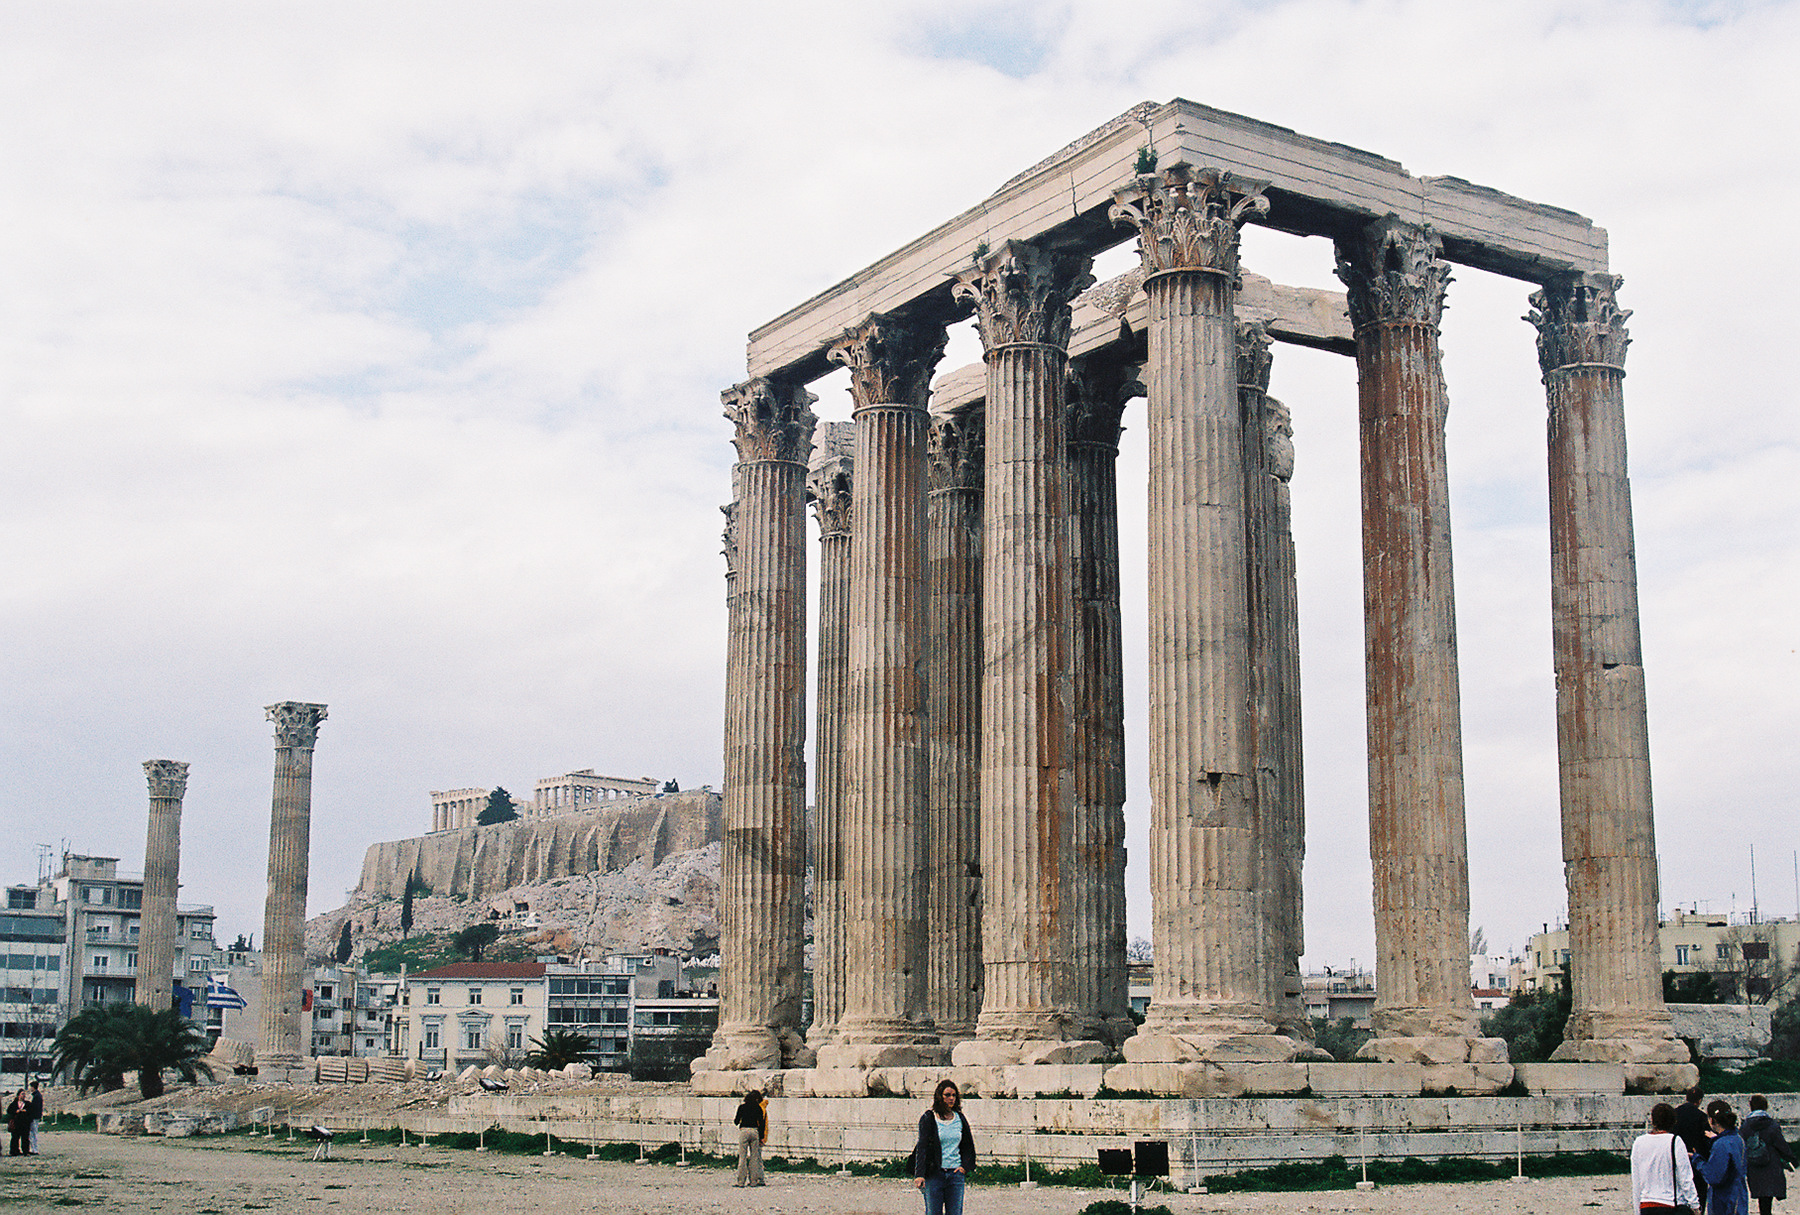 File:Temple of Olympian Zeus, Athens.jpg